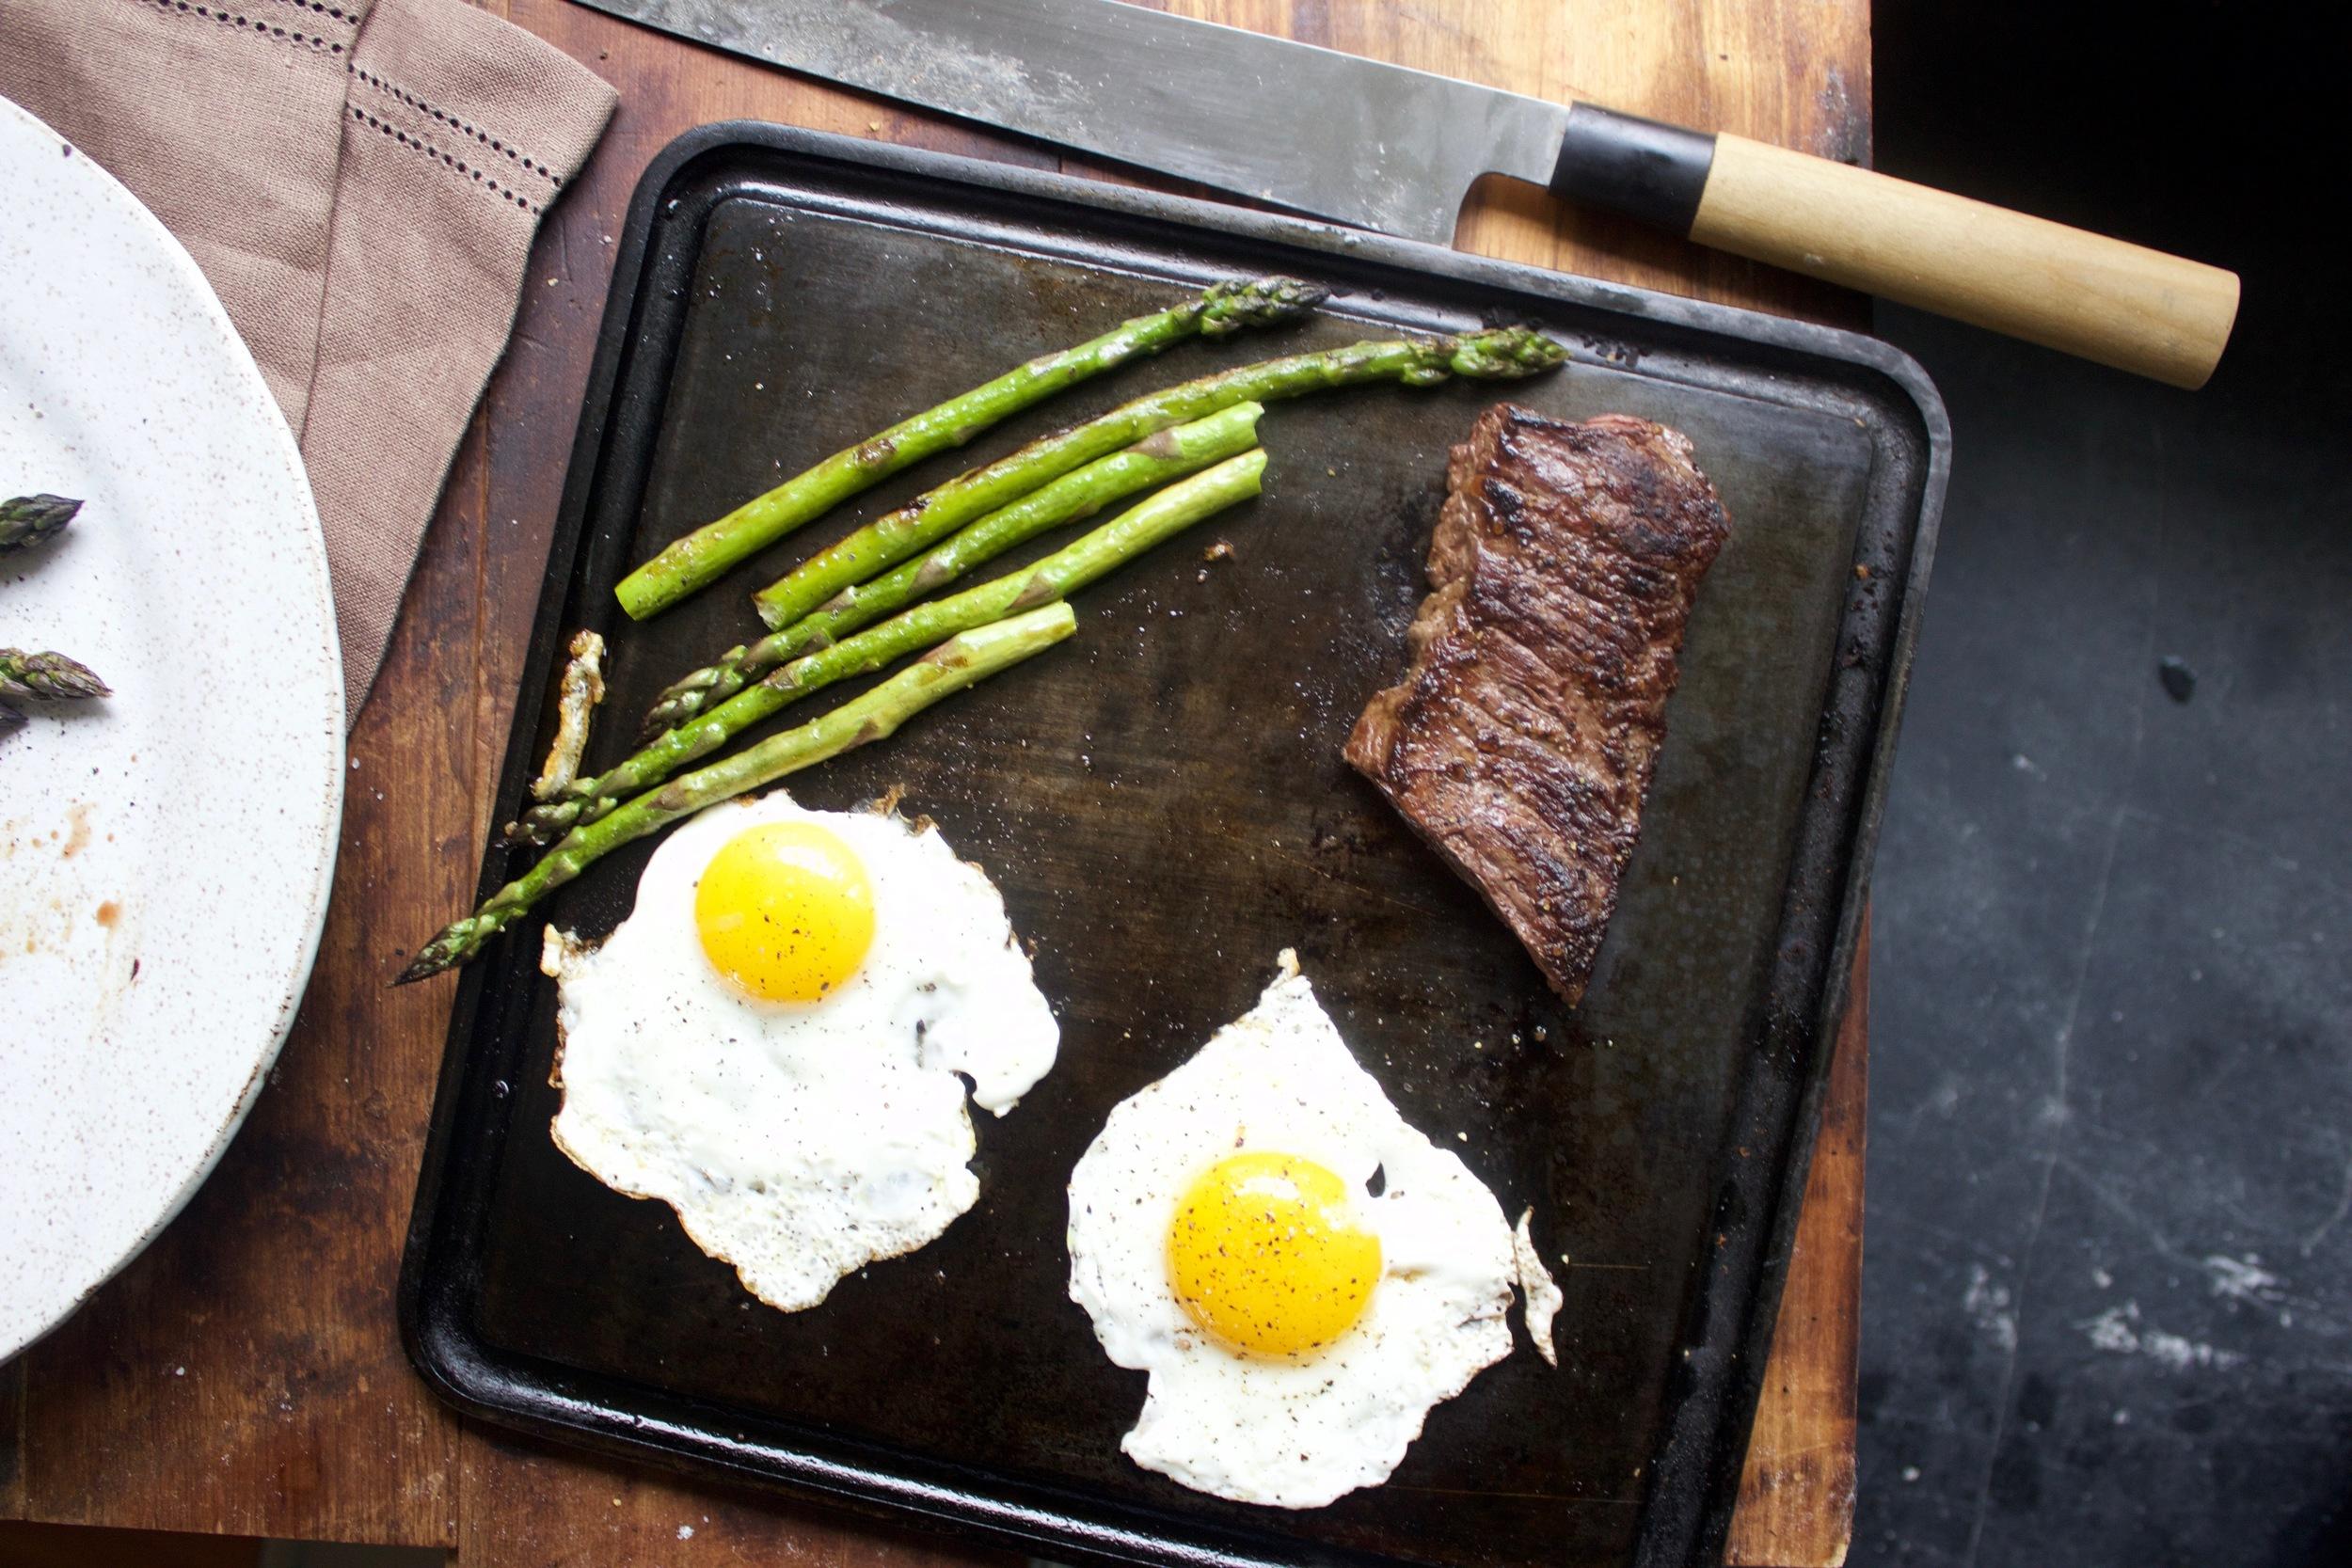 Tasty Steak and Eggs on the Baking Steel Mini